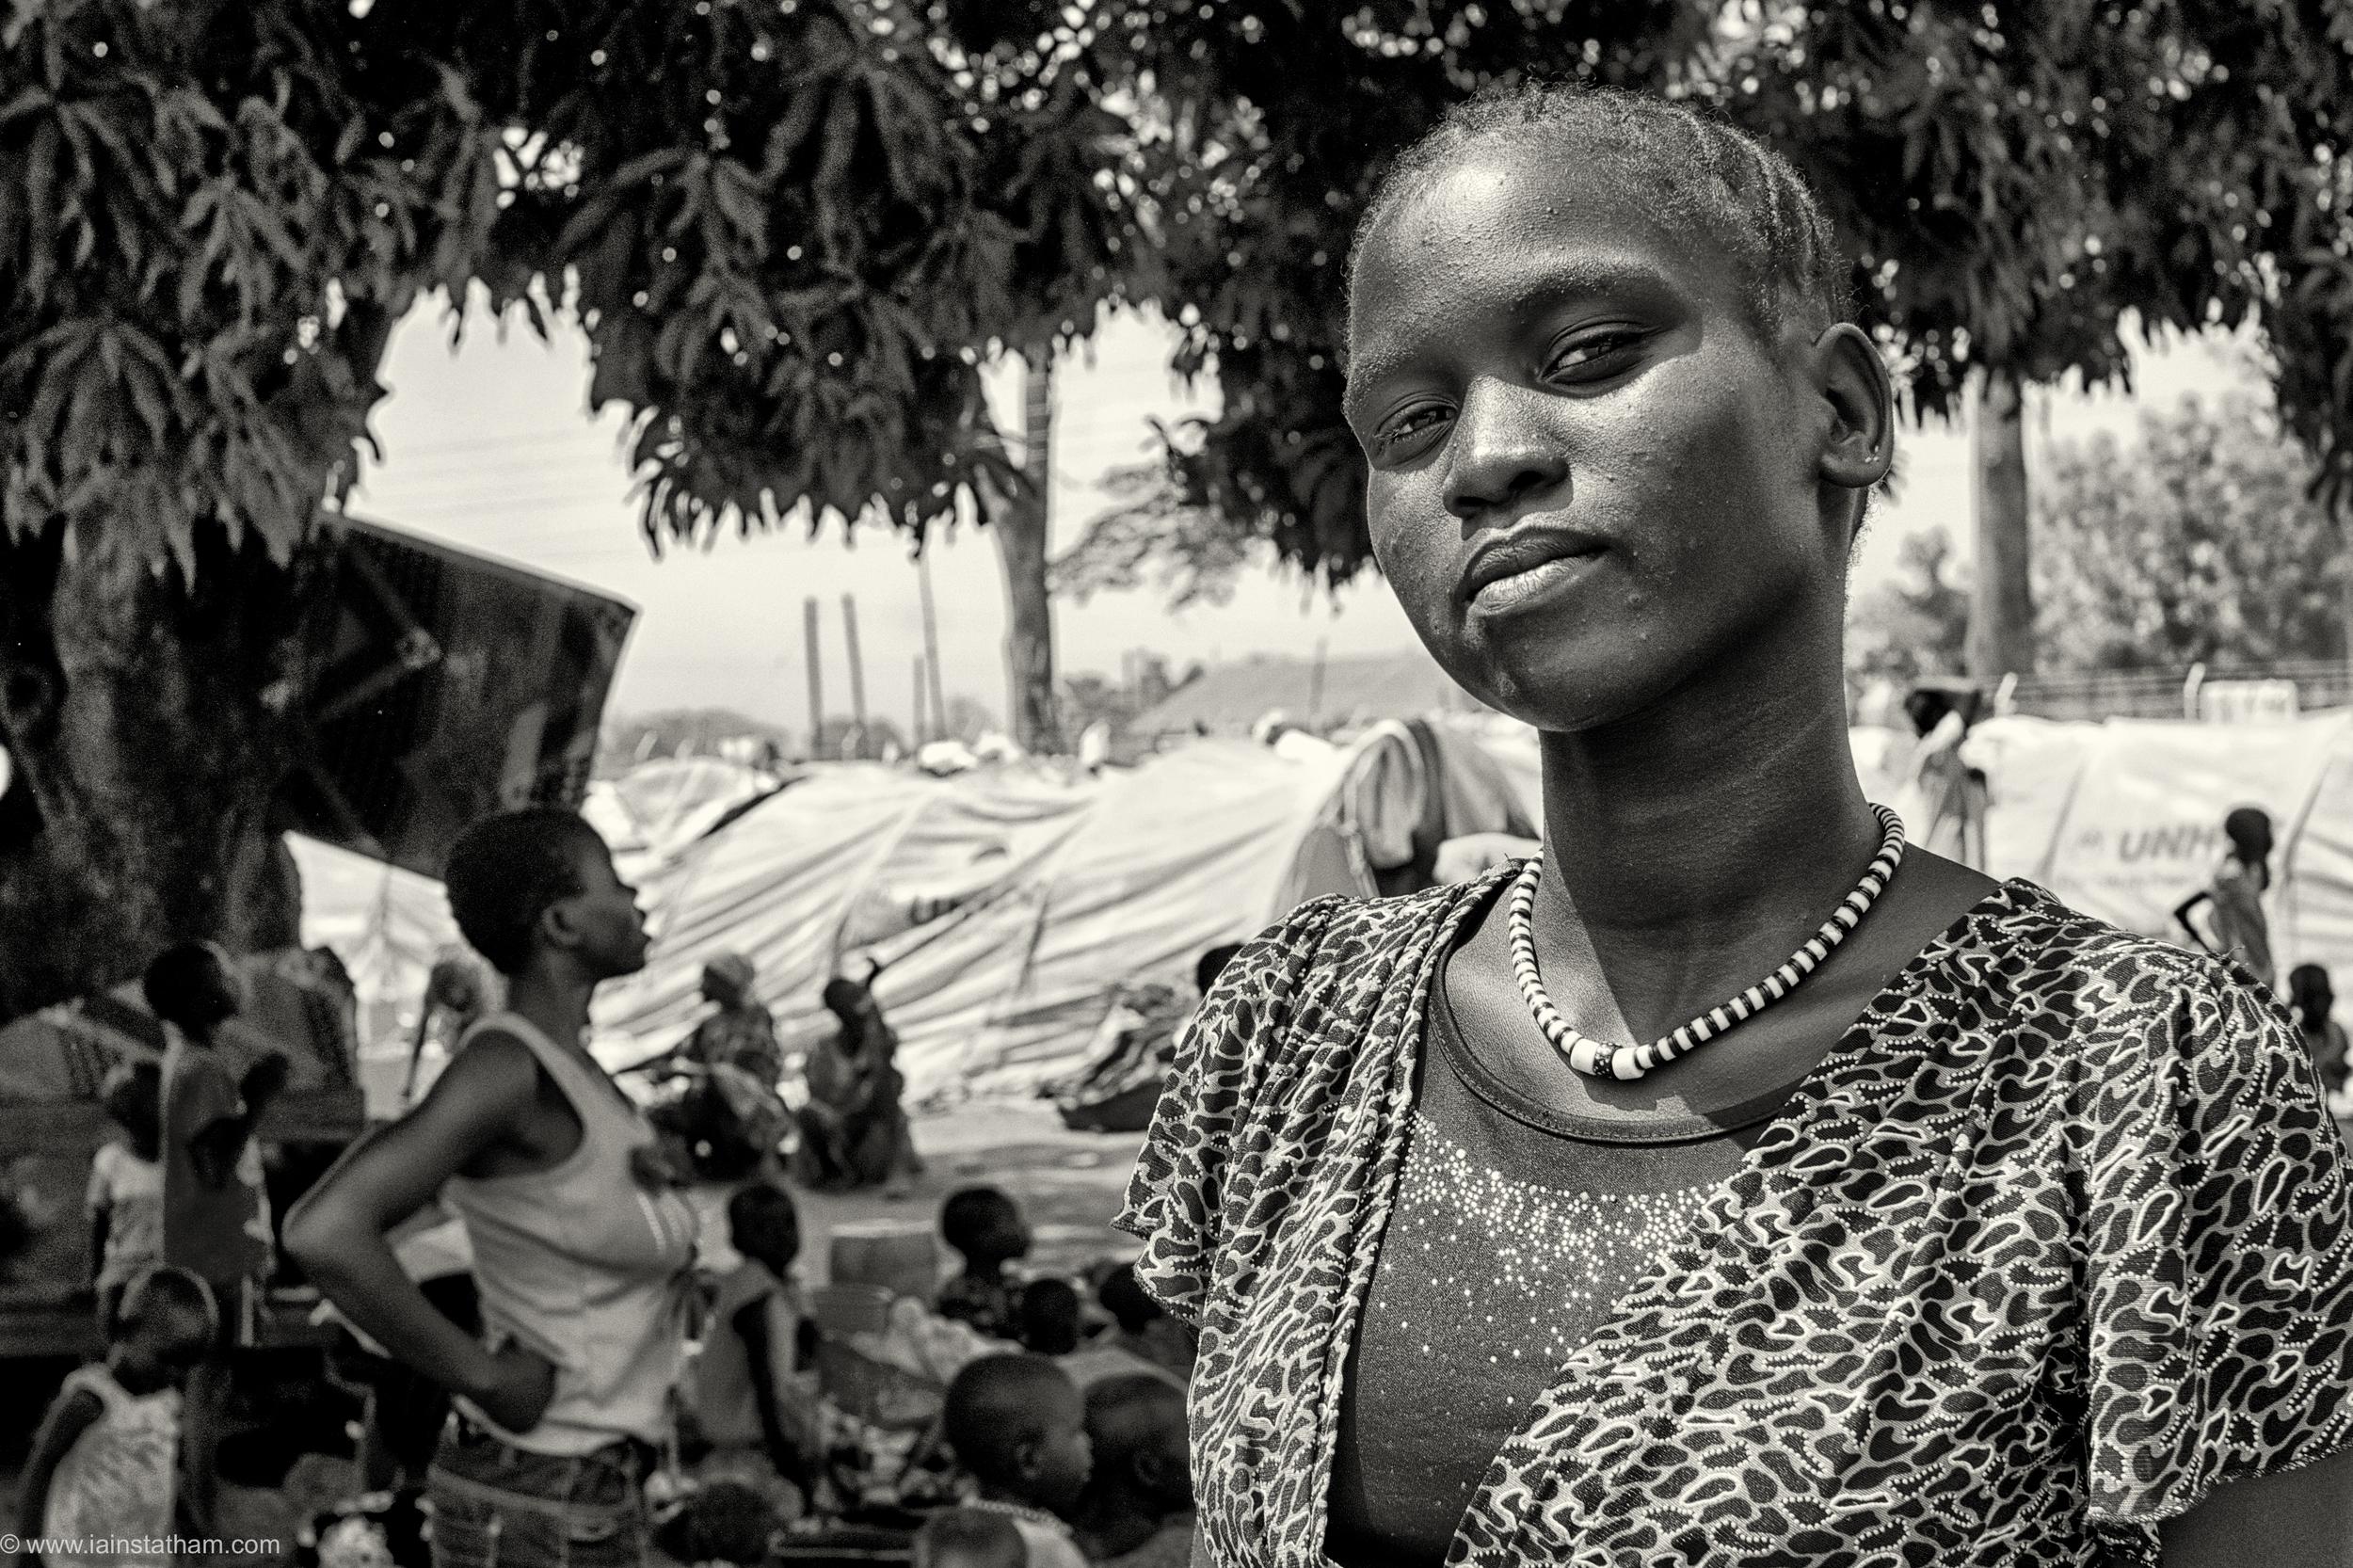 ug - south sudan refugees - dziapi - bw-9.jpg